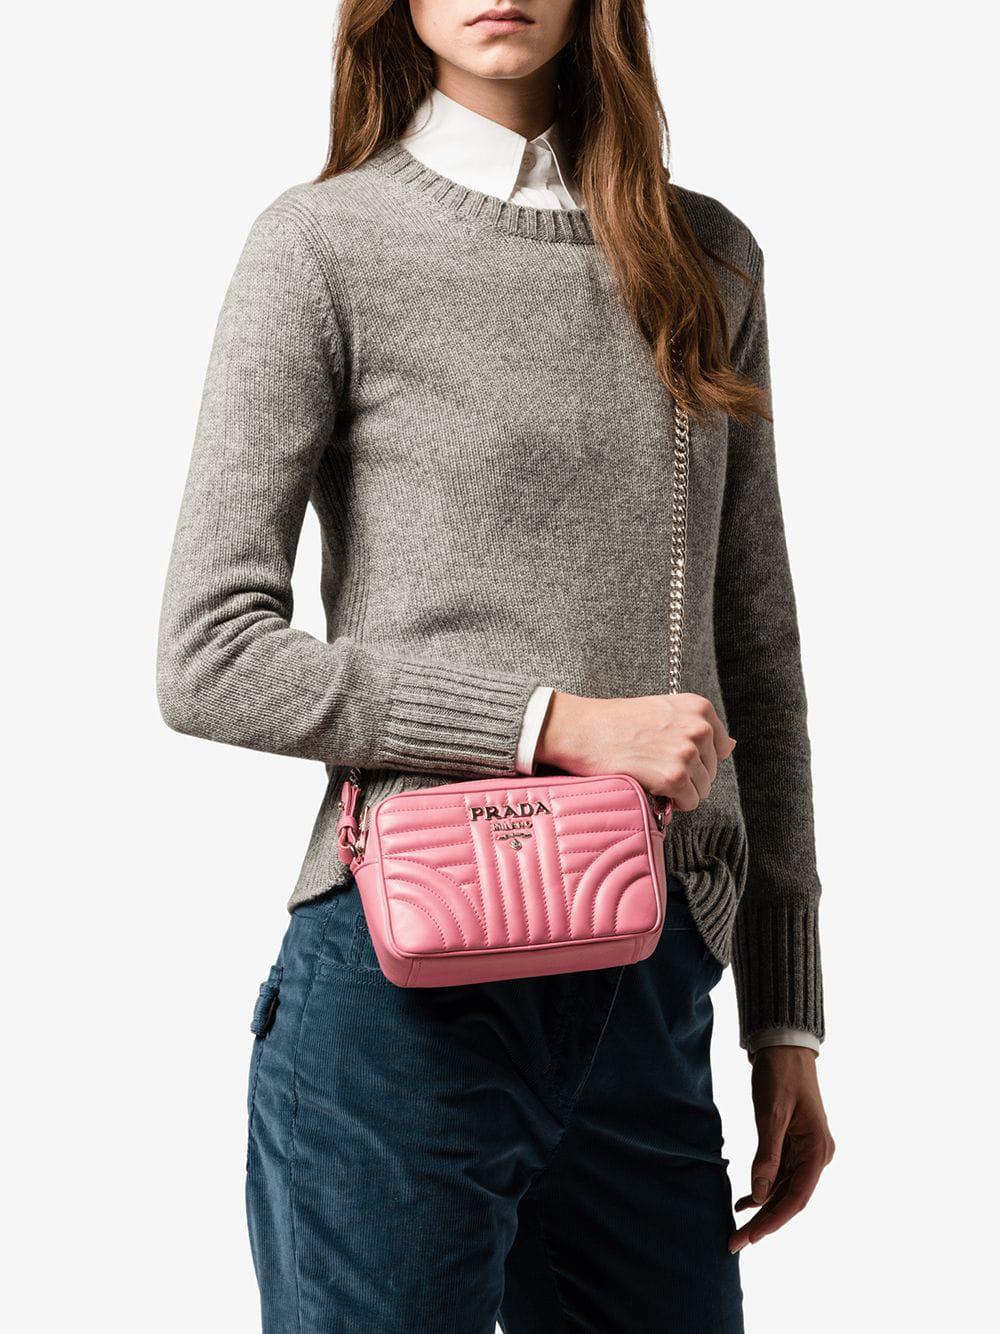 8a8cc6322e72 Lyst - Prada Diagramme Shoulder Bag in Pink